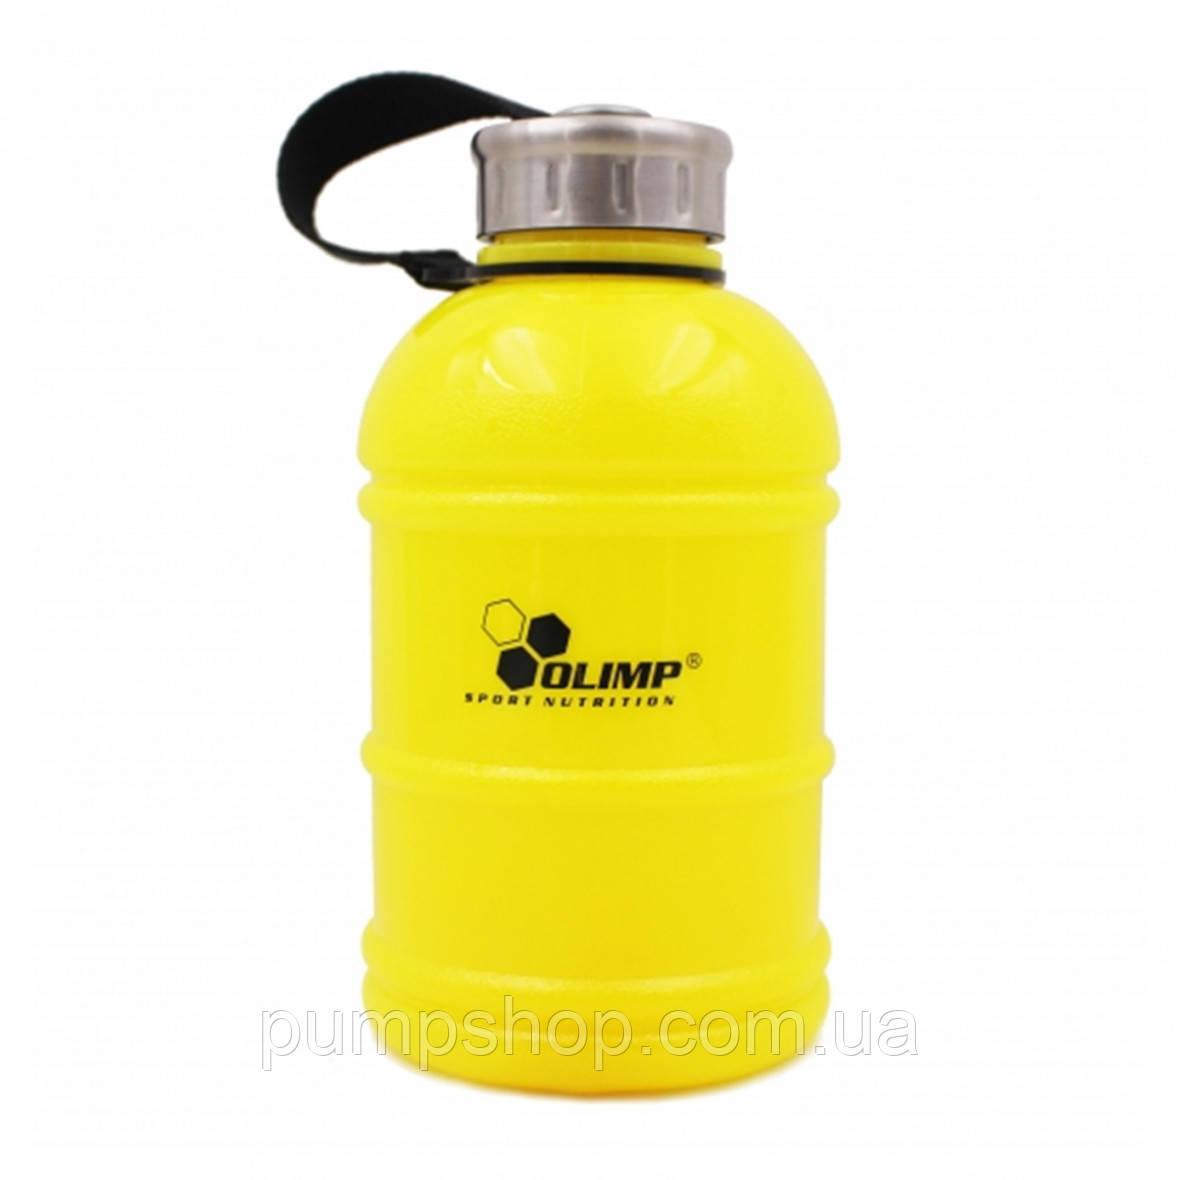 Бутылка Галлон Olimp Sport Nutrition 1100 мл желтая